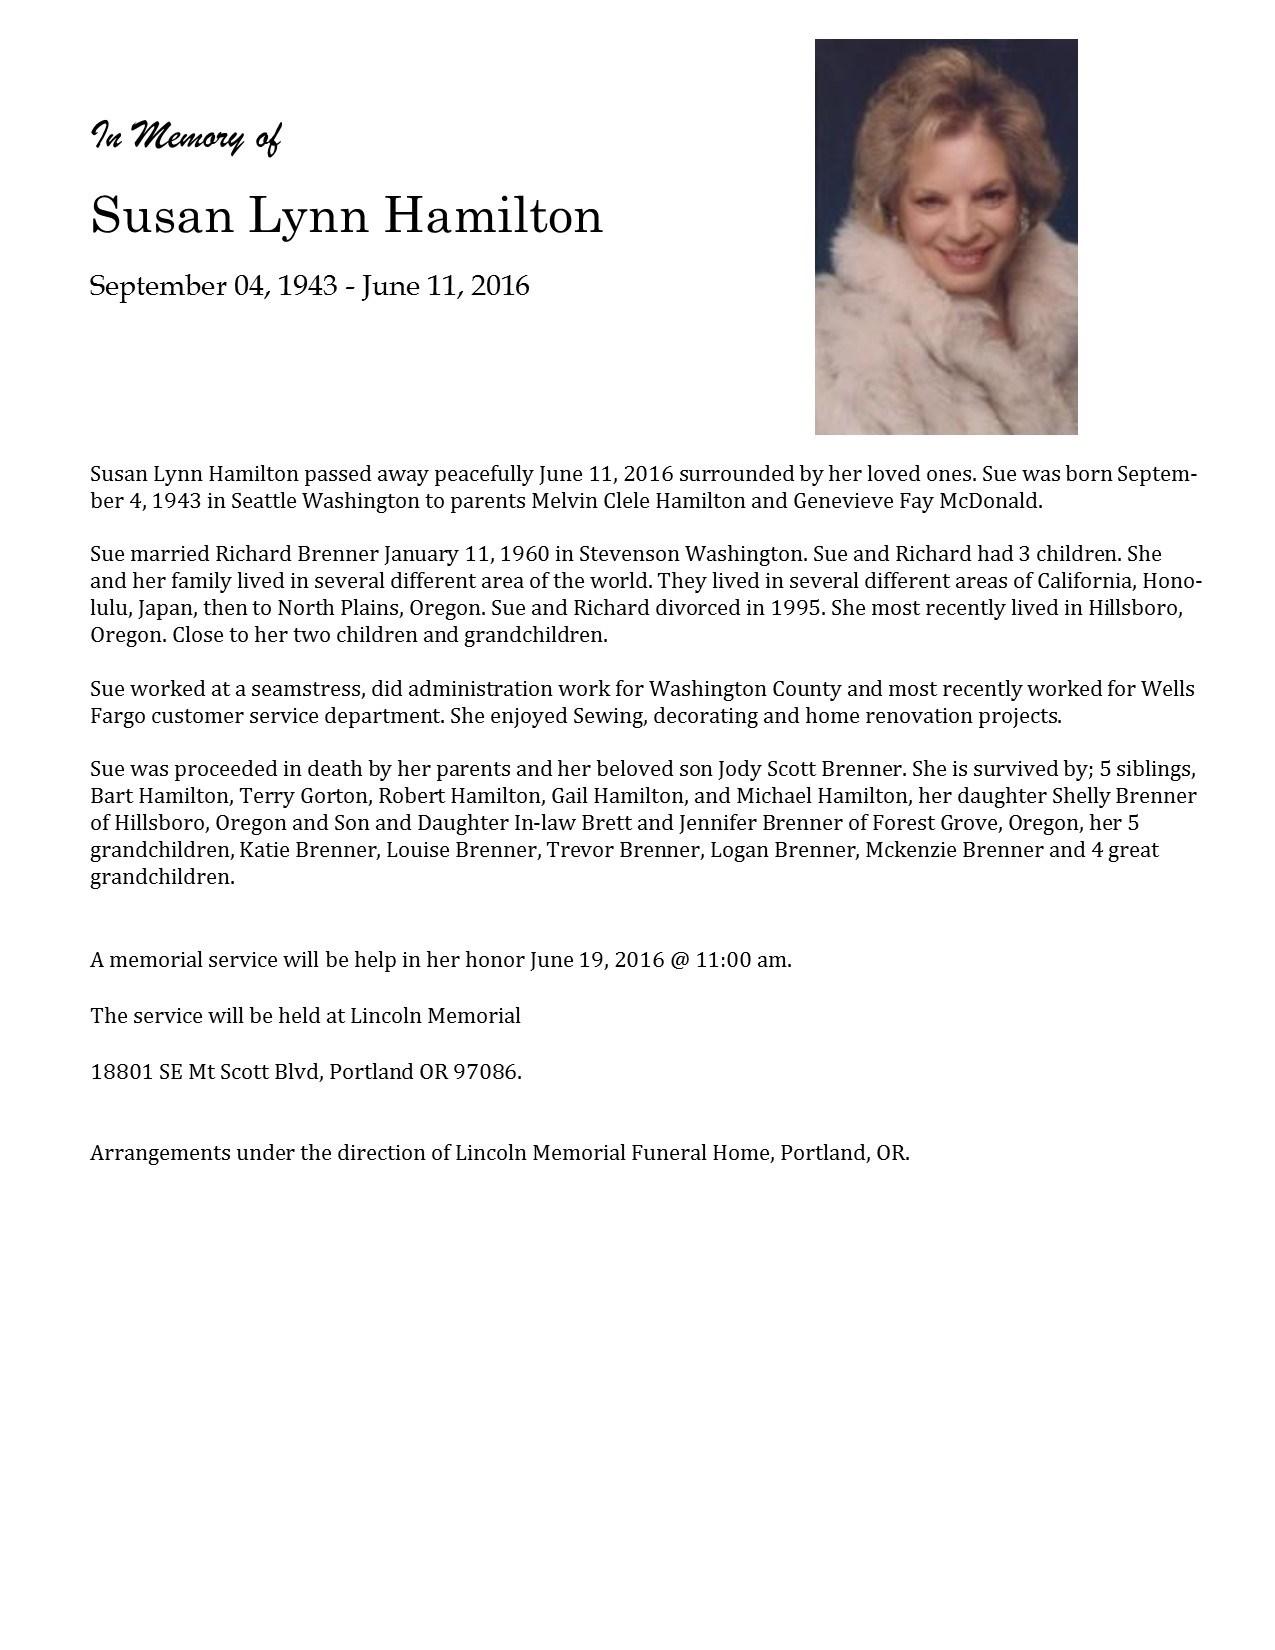 Susan Lynn Hamilton